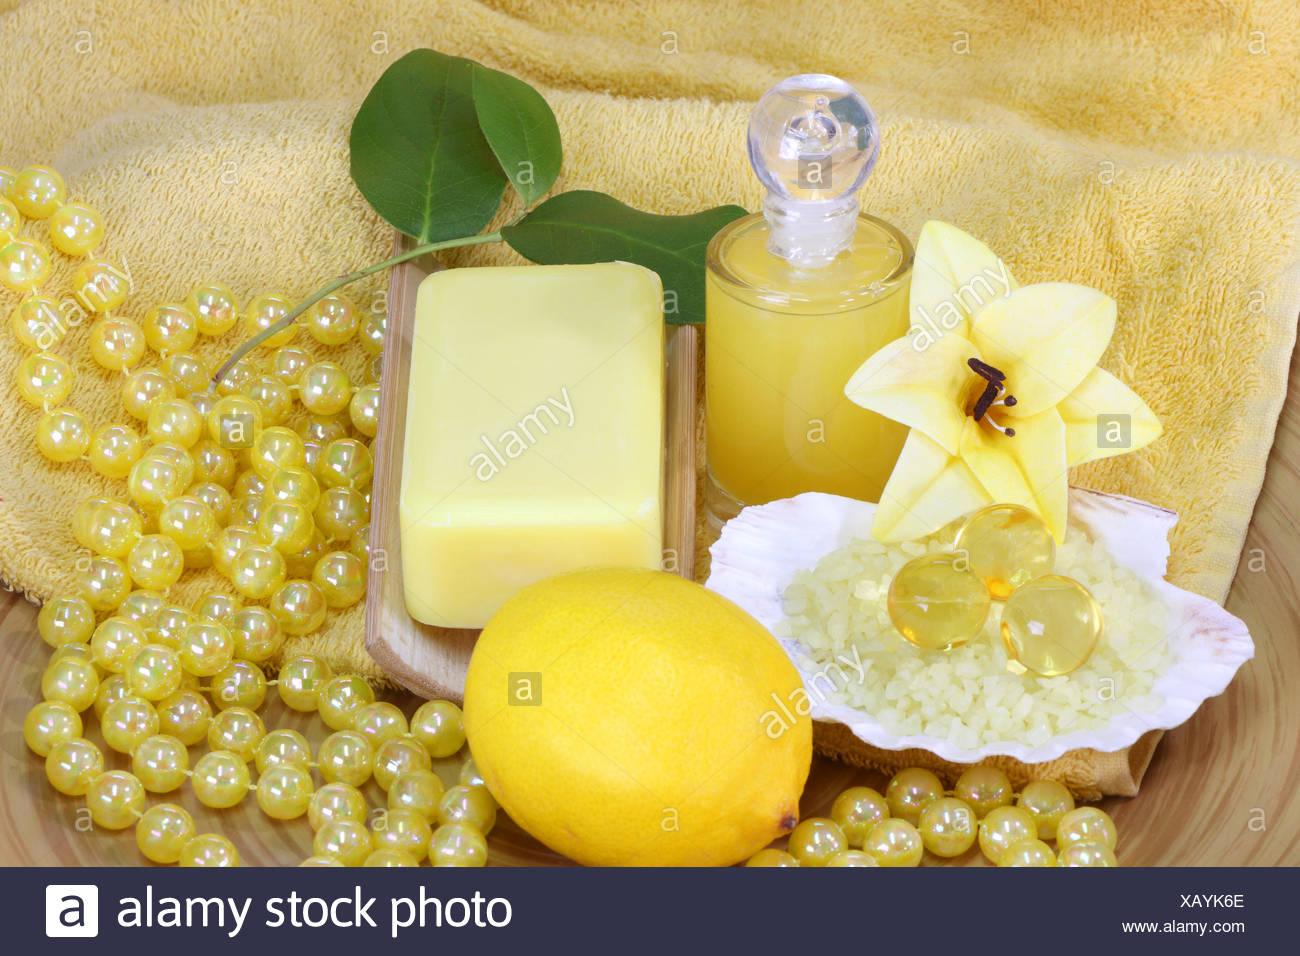 Soap Maintenance Medium Skincare Shell Decoration Hygiene Decorative